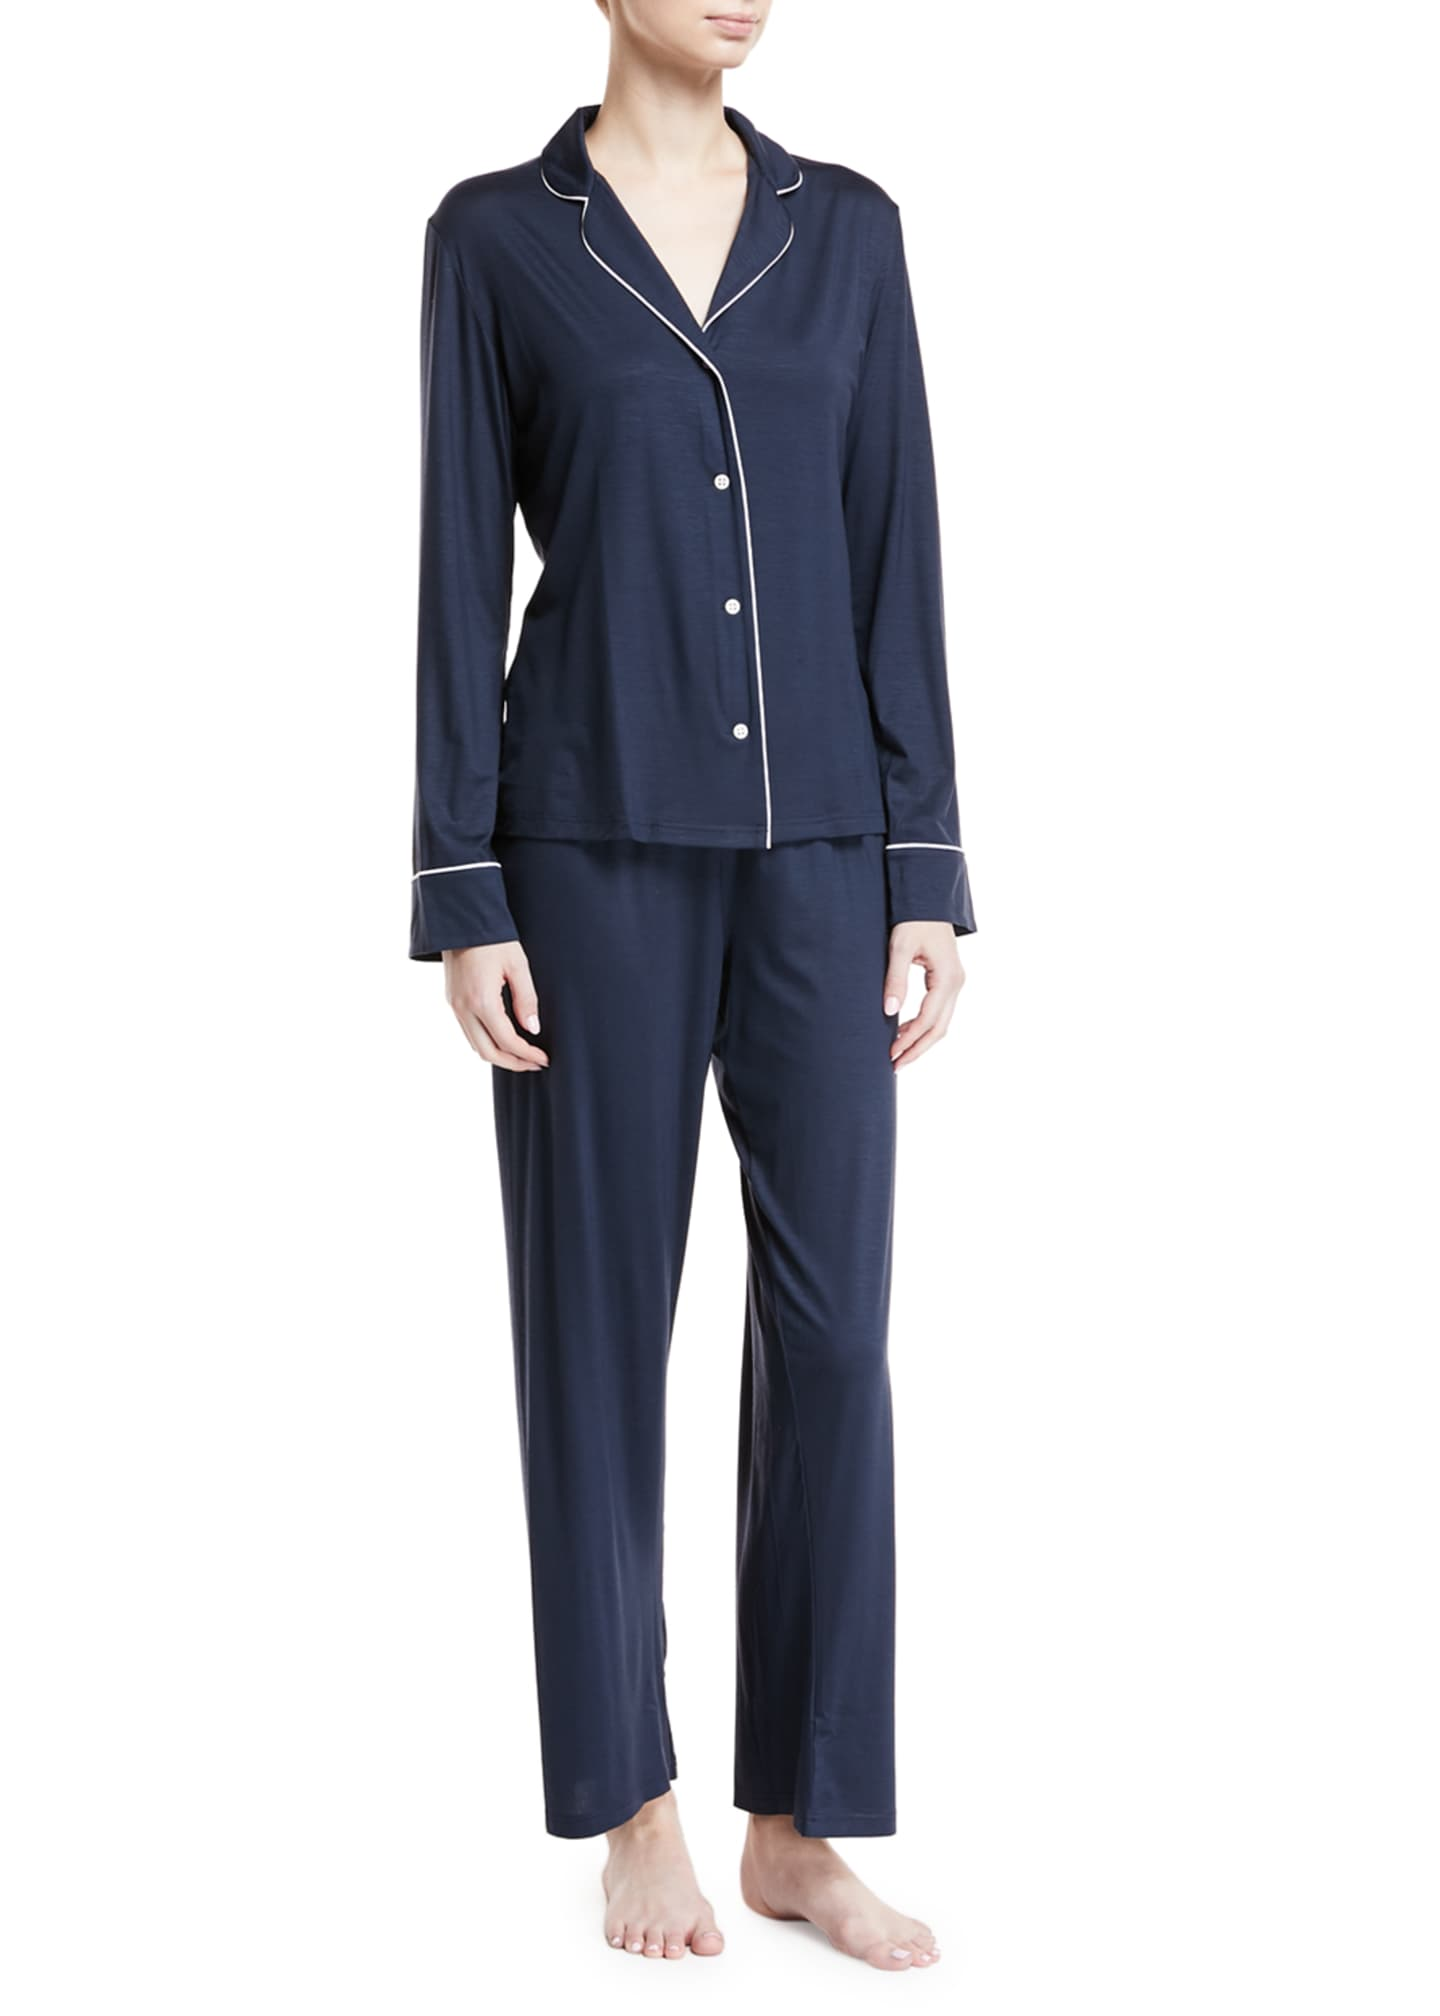 Derek Rose Carla Classic Piped Knit Pajama Set